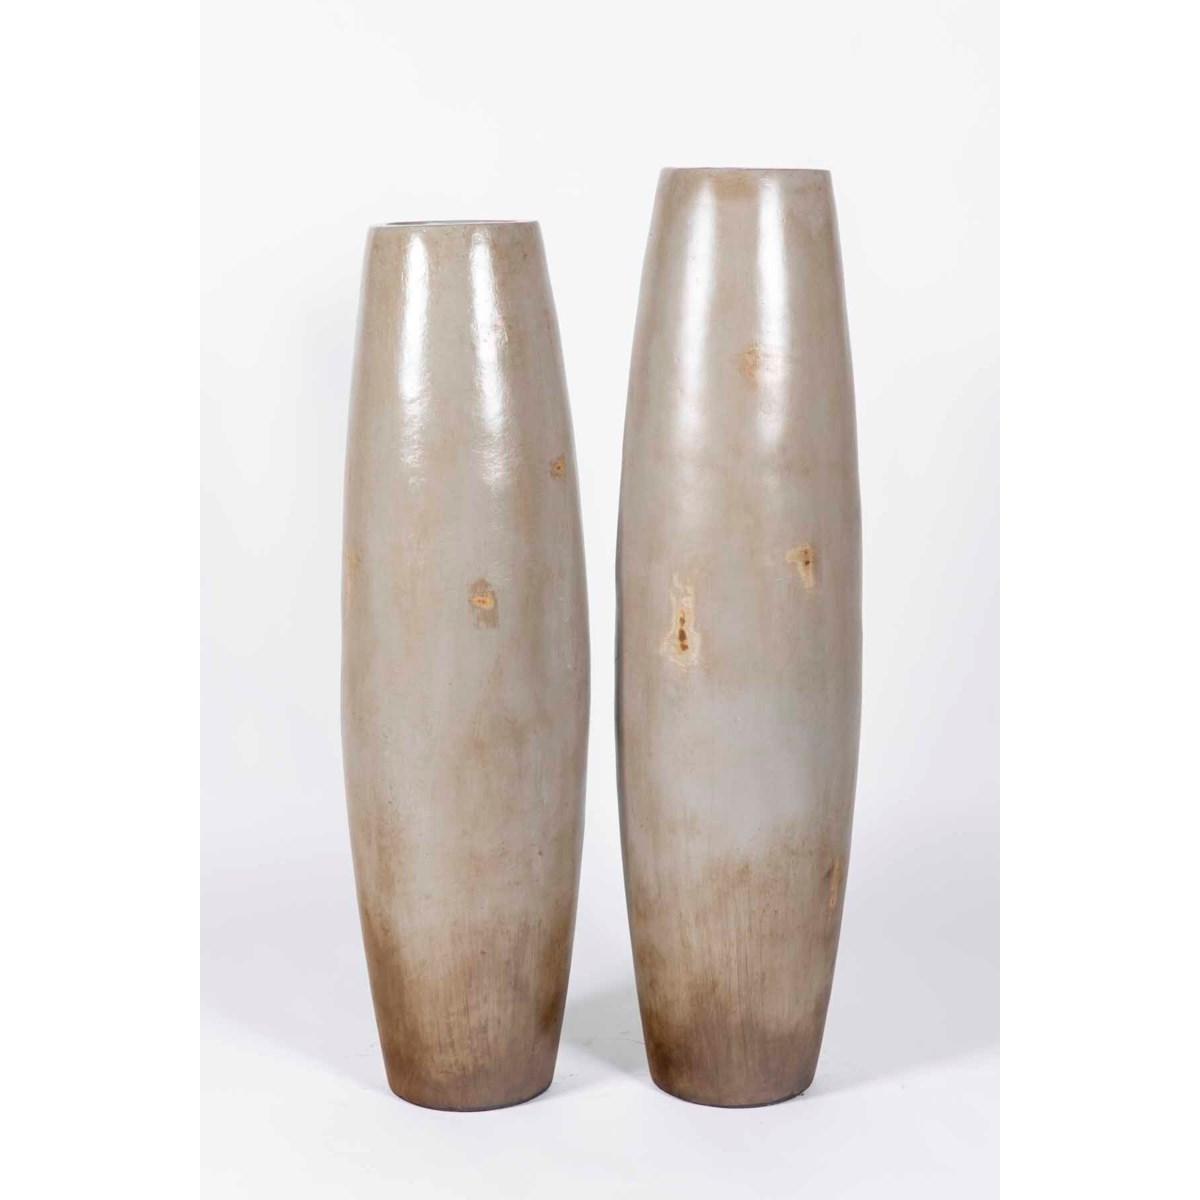 Small Barrel Floor Vase in Sandalwood Finish